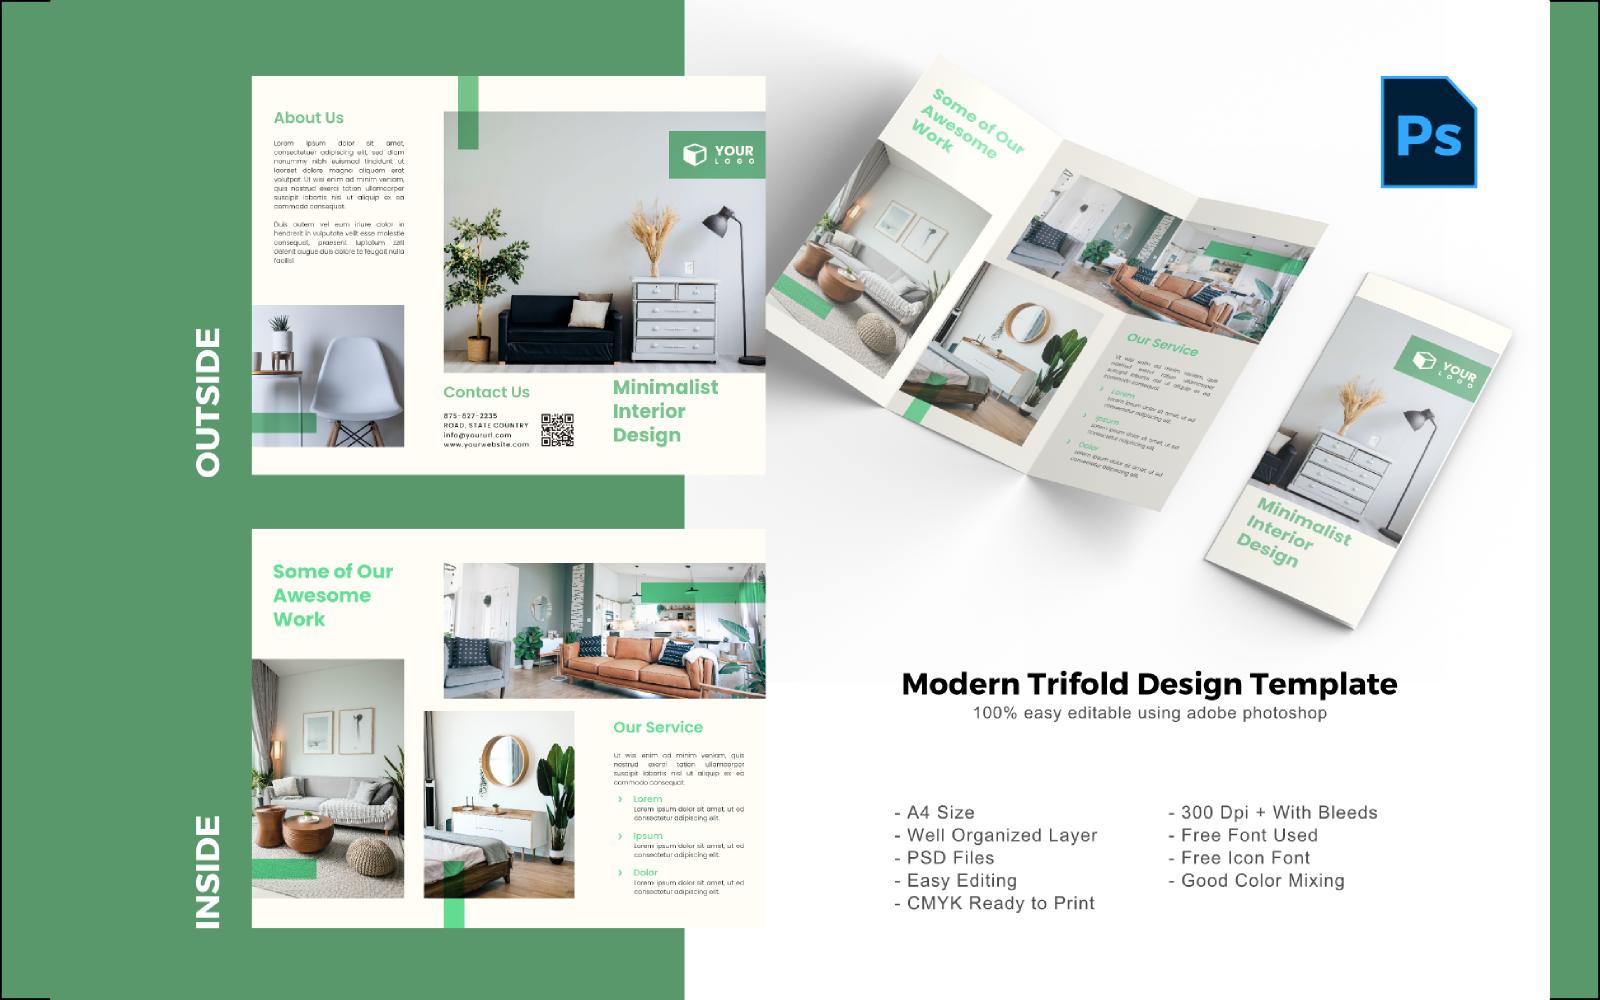 Interior Trifold Brochure PSD sablon 150204